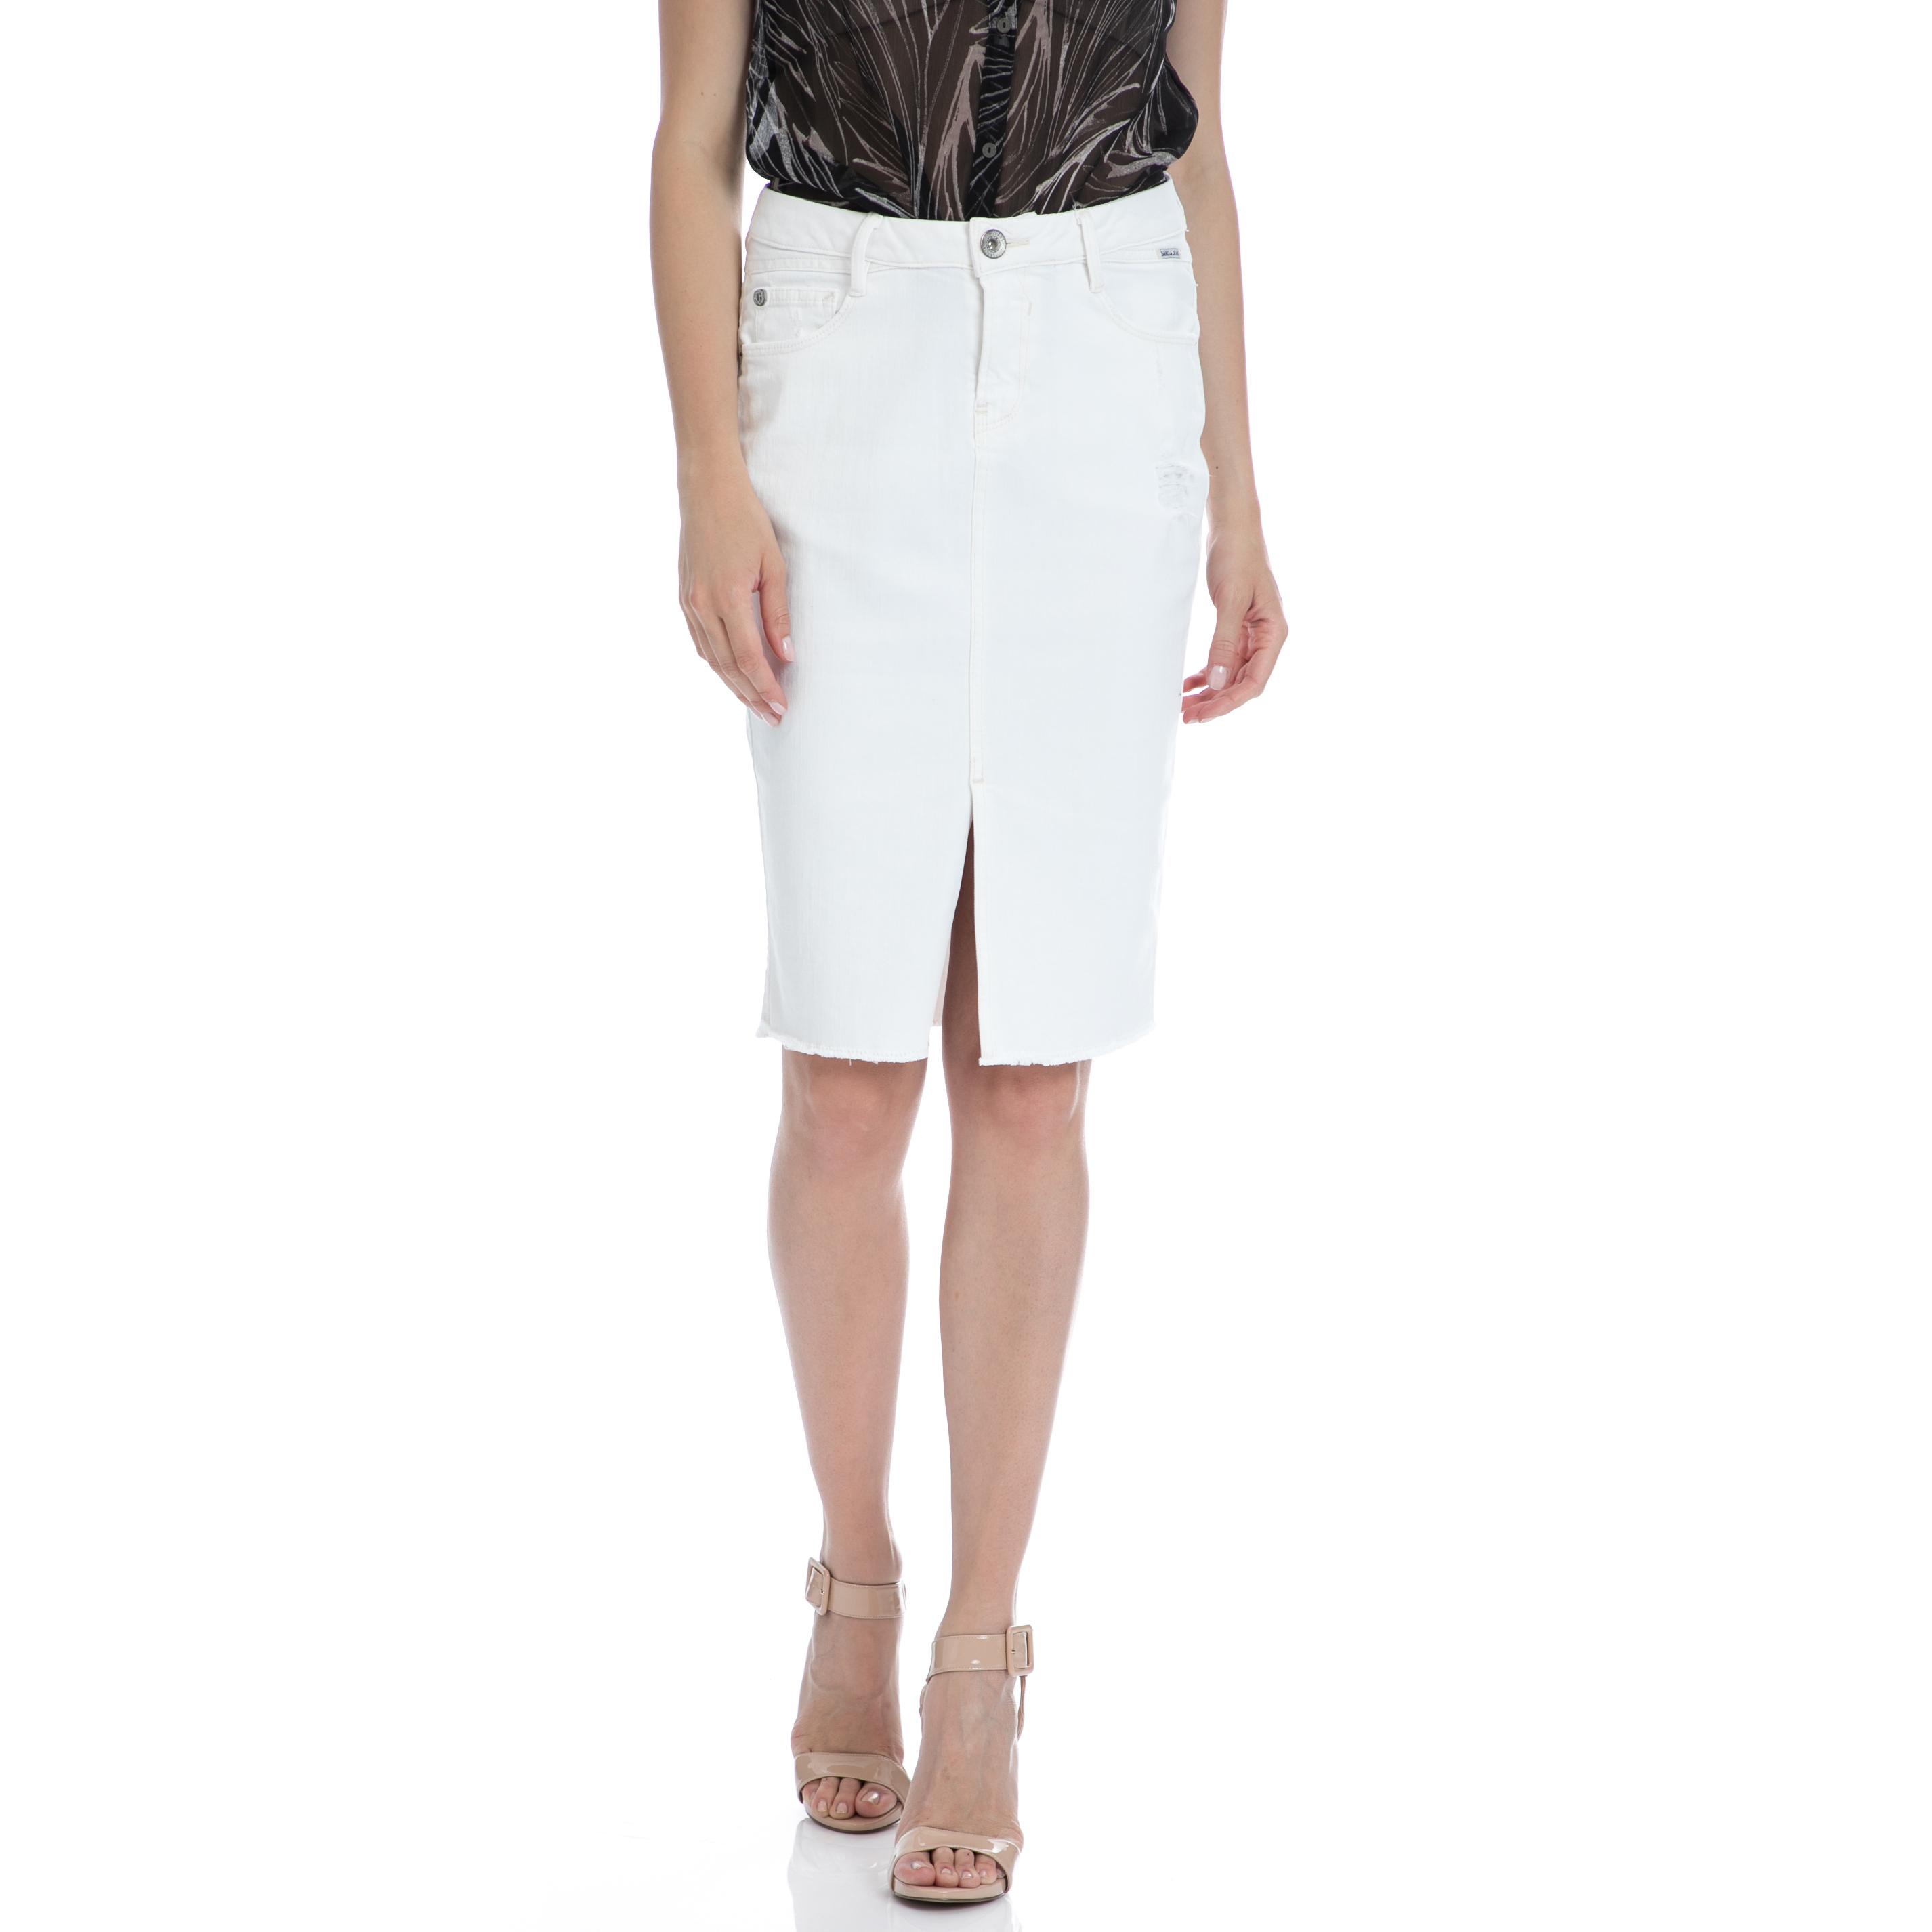 149fc25d76 GARCIA JEANS Γυναικεία τζιν σαλοπέτα λευκή γυναικεία ρούχα ολόσωμες ...